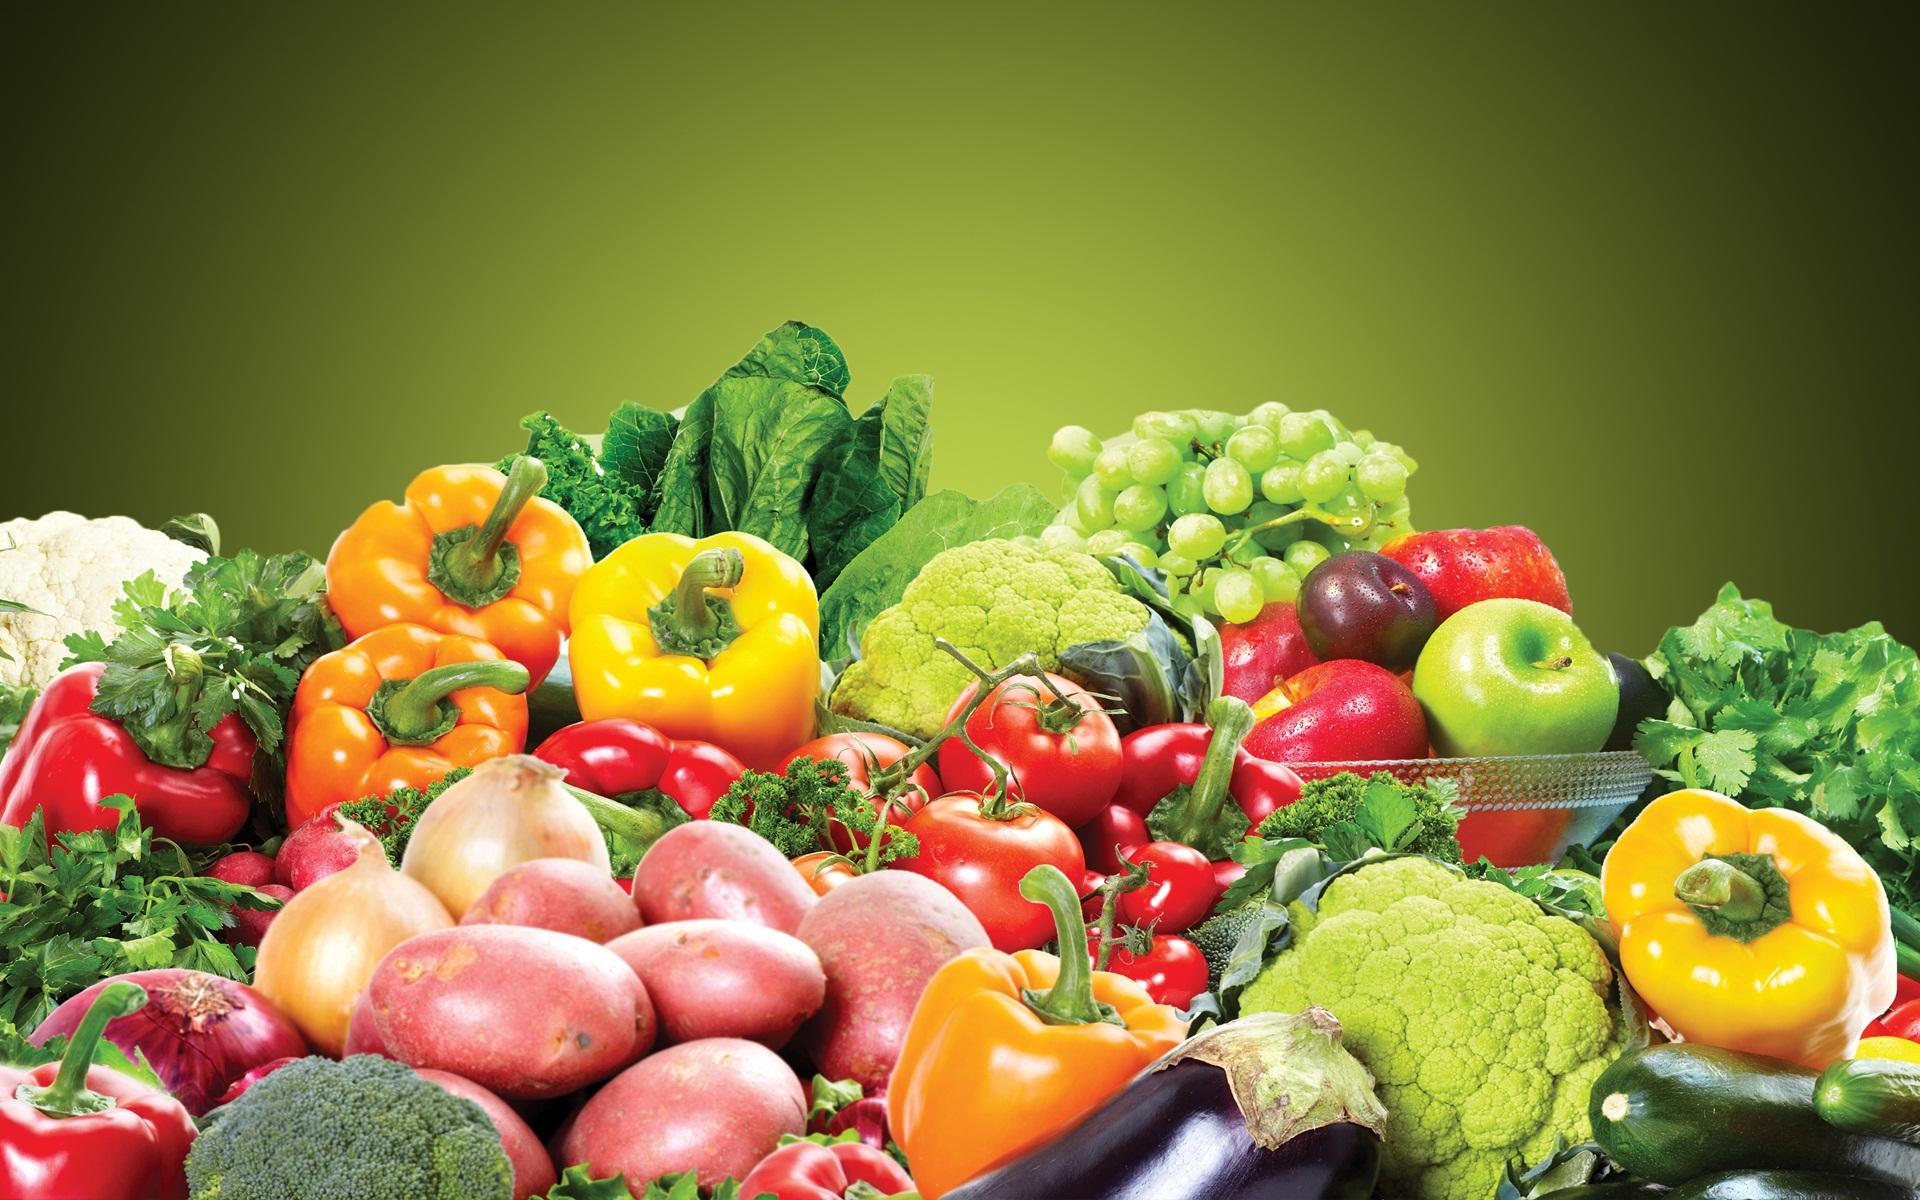 Fruit & Vegetables - Cyprus Trade Centre - Dubai, UAE